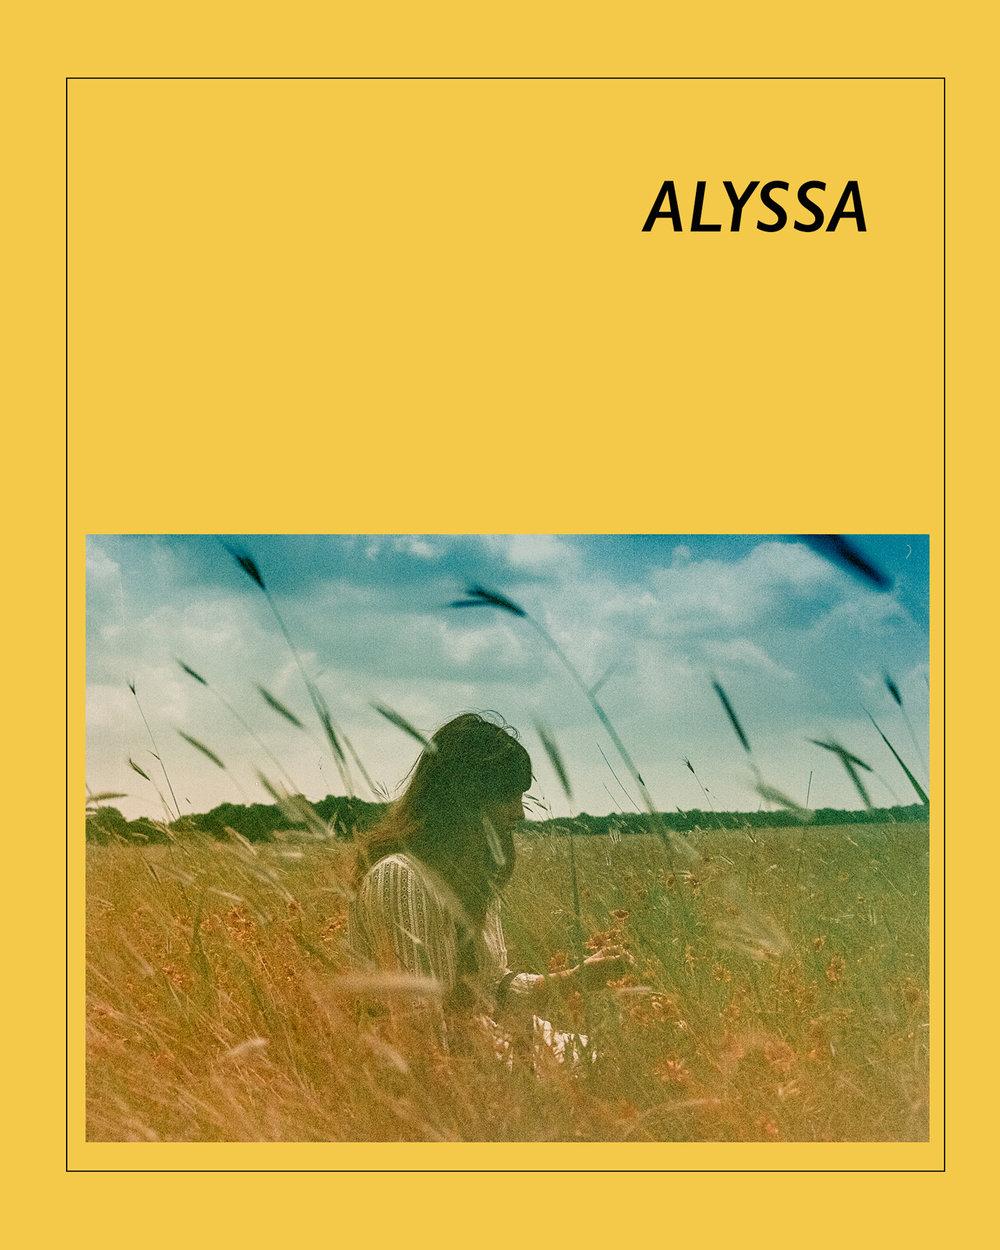 alyssa_yellow_background_3-2.jpg